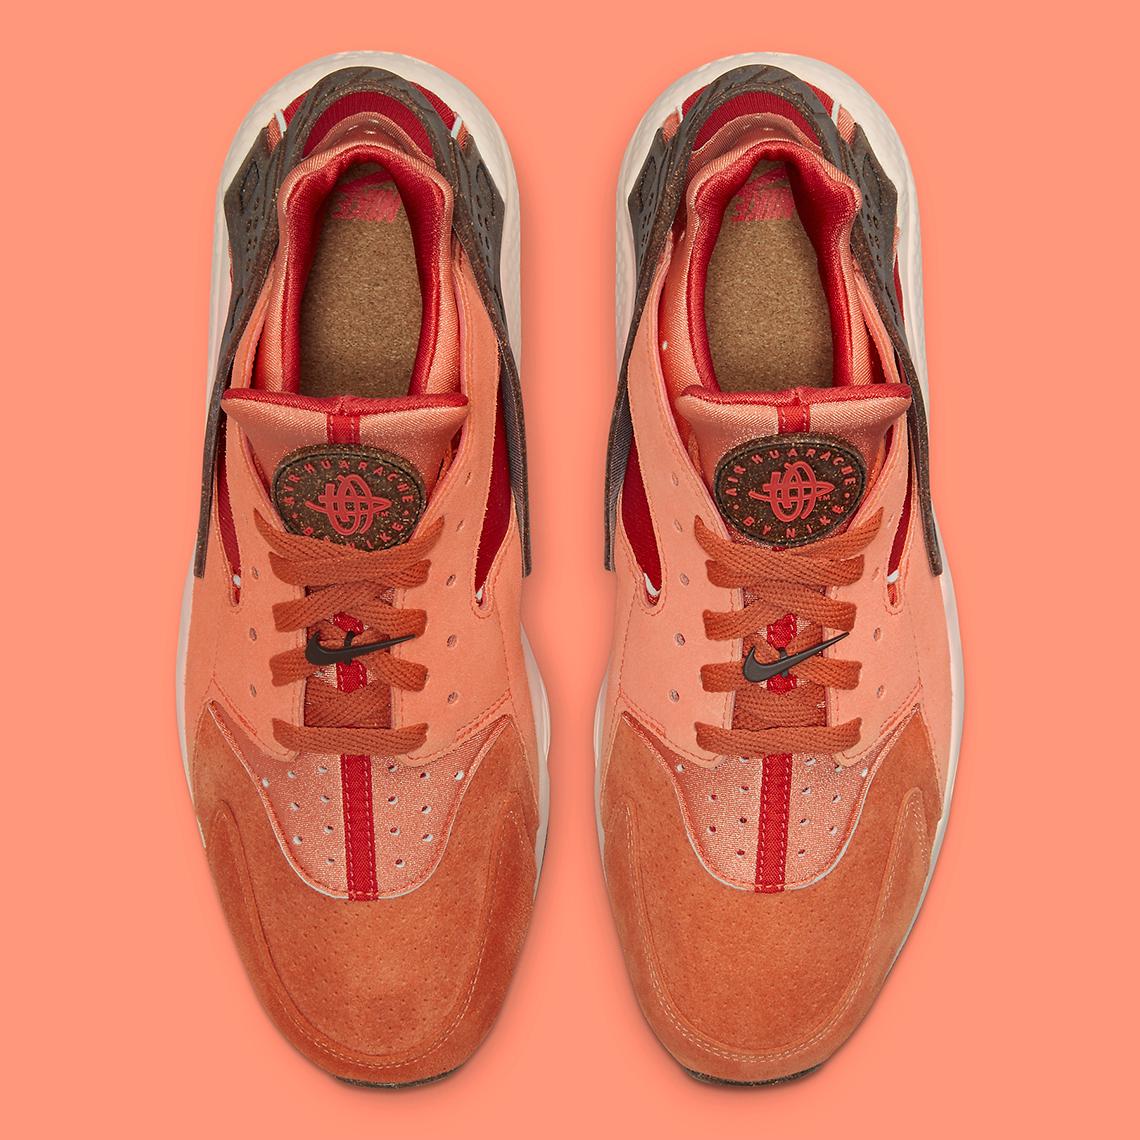 Nike Air Huarache Turf Orange Chile Red Orange Frost DM6238-800 ...